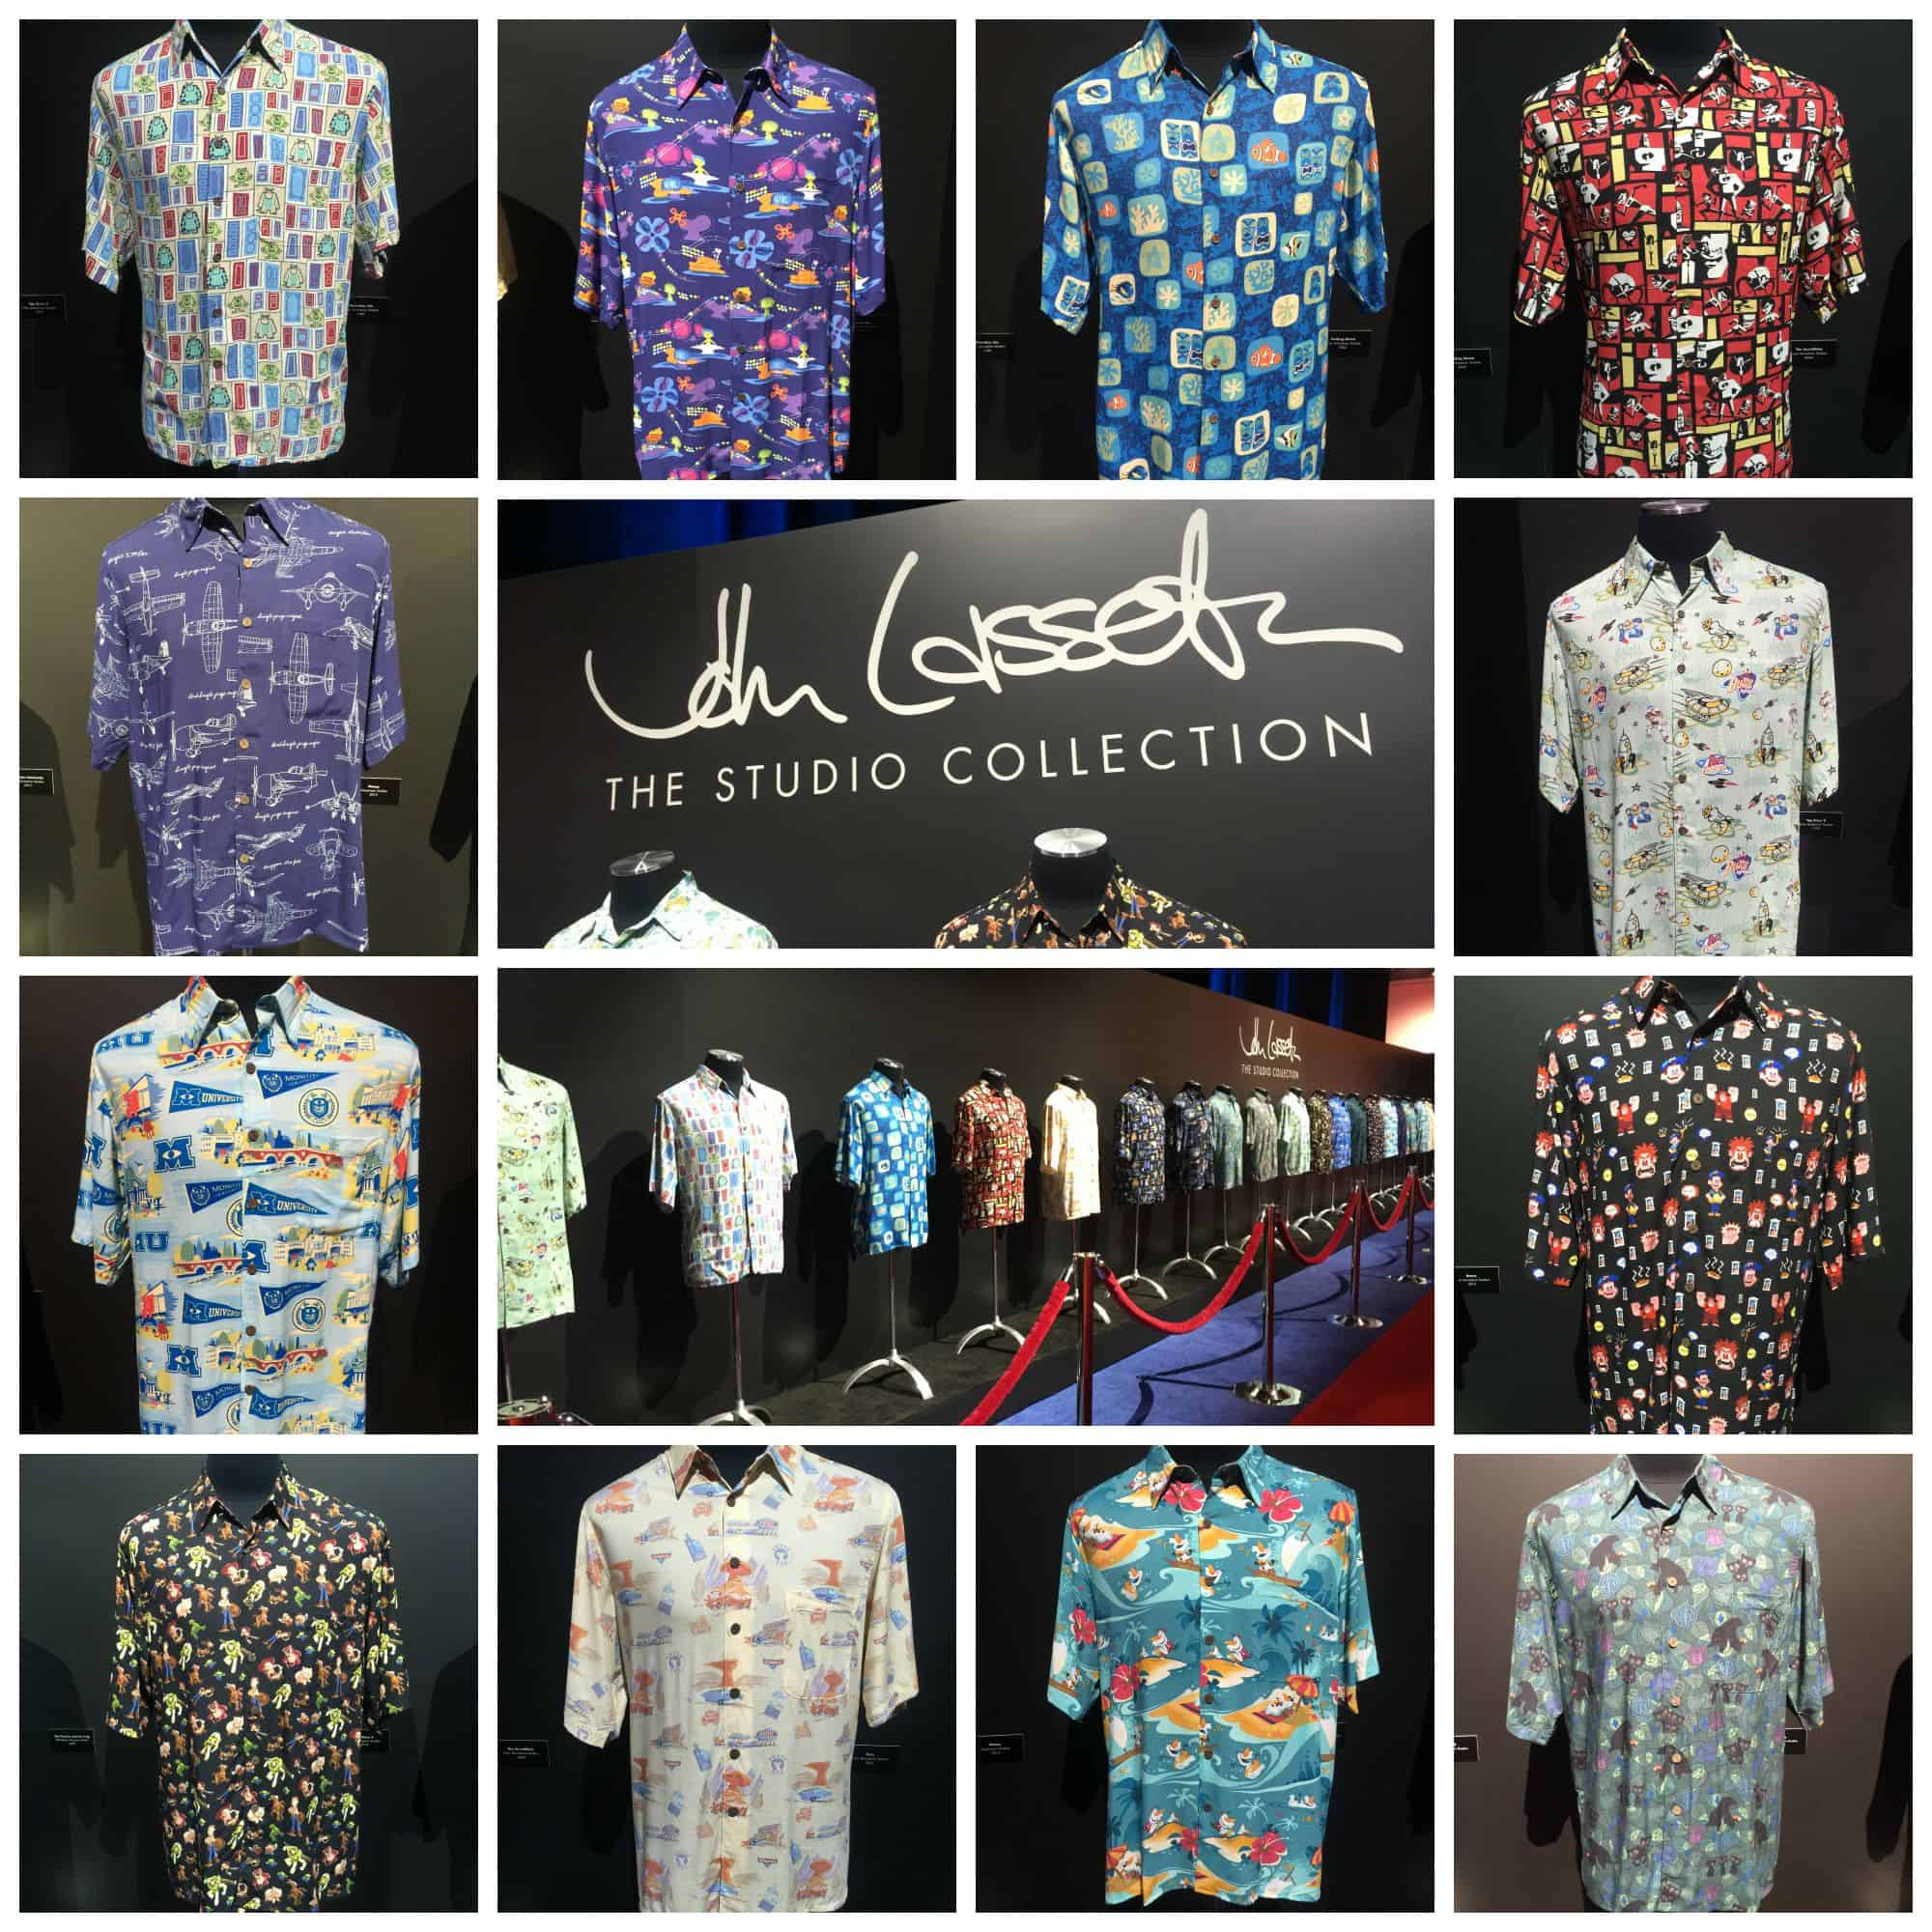 John lasseter 39 s studio hawaiian shirt collection half for John lasseter disney shirts